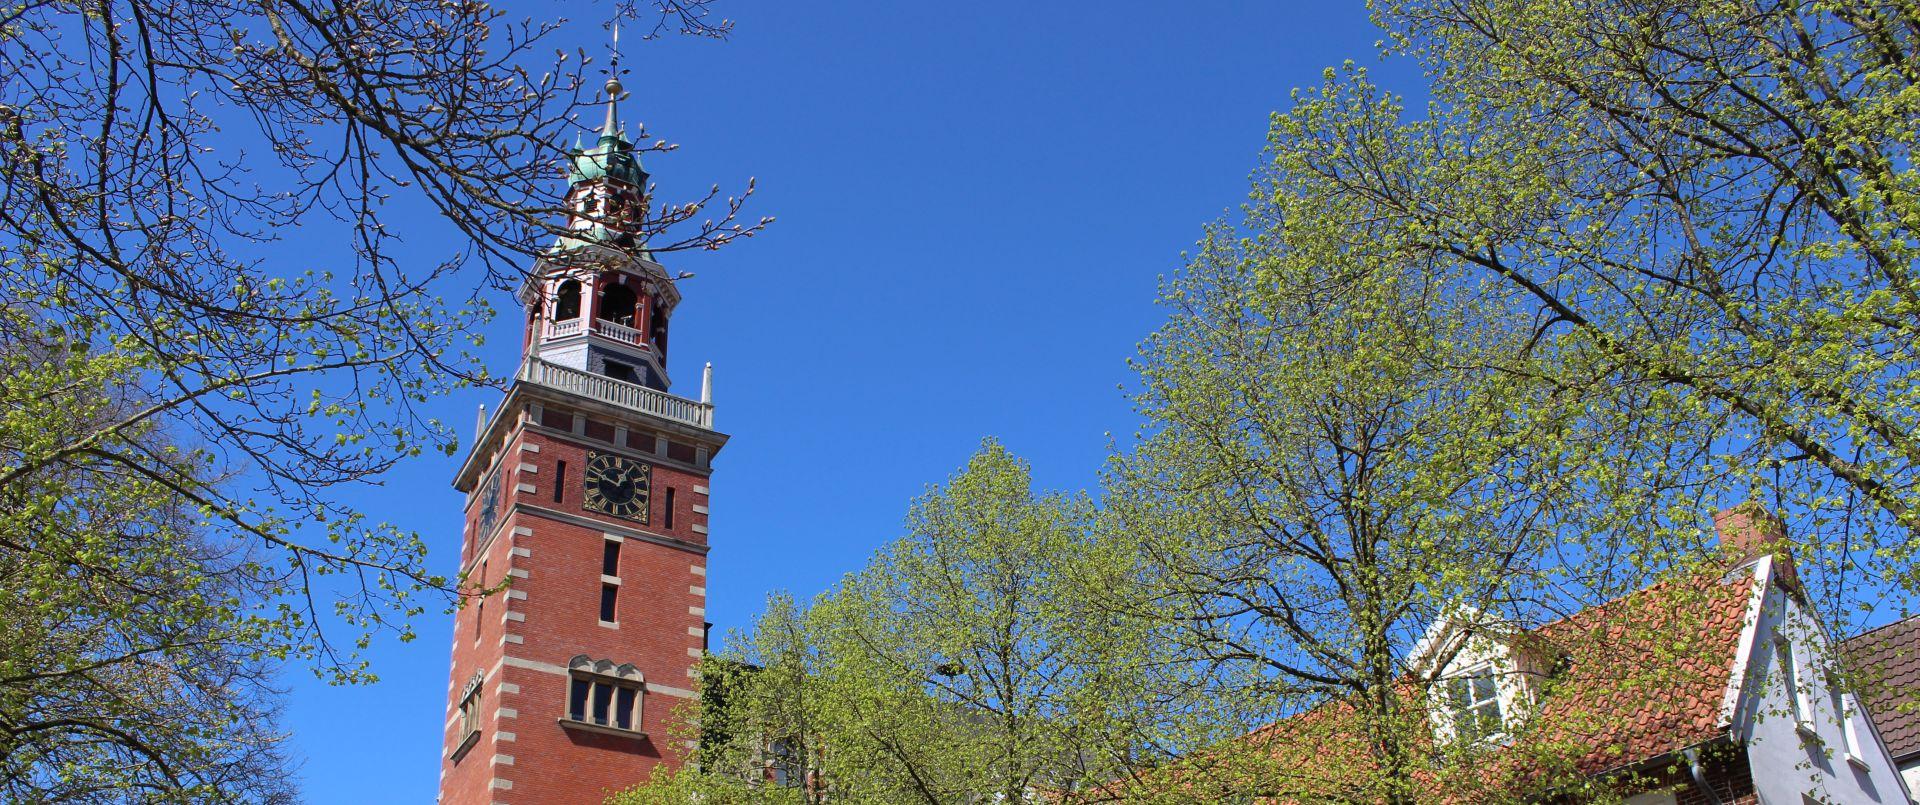 Rathausturm Leer